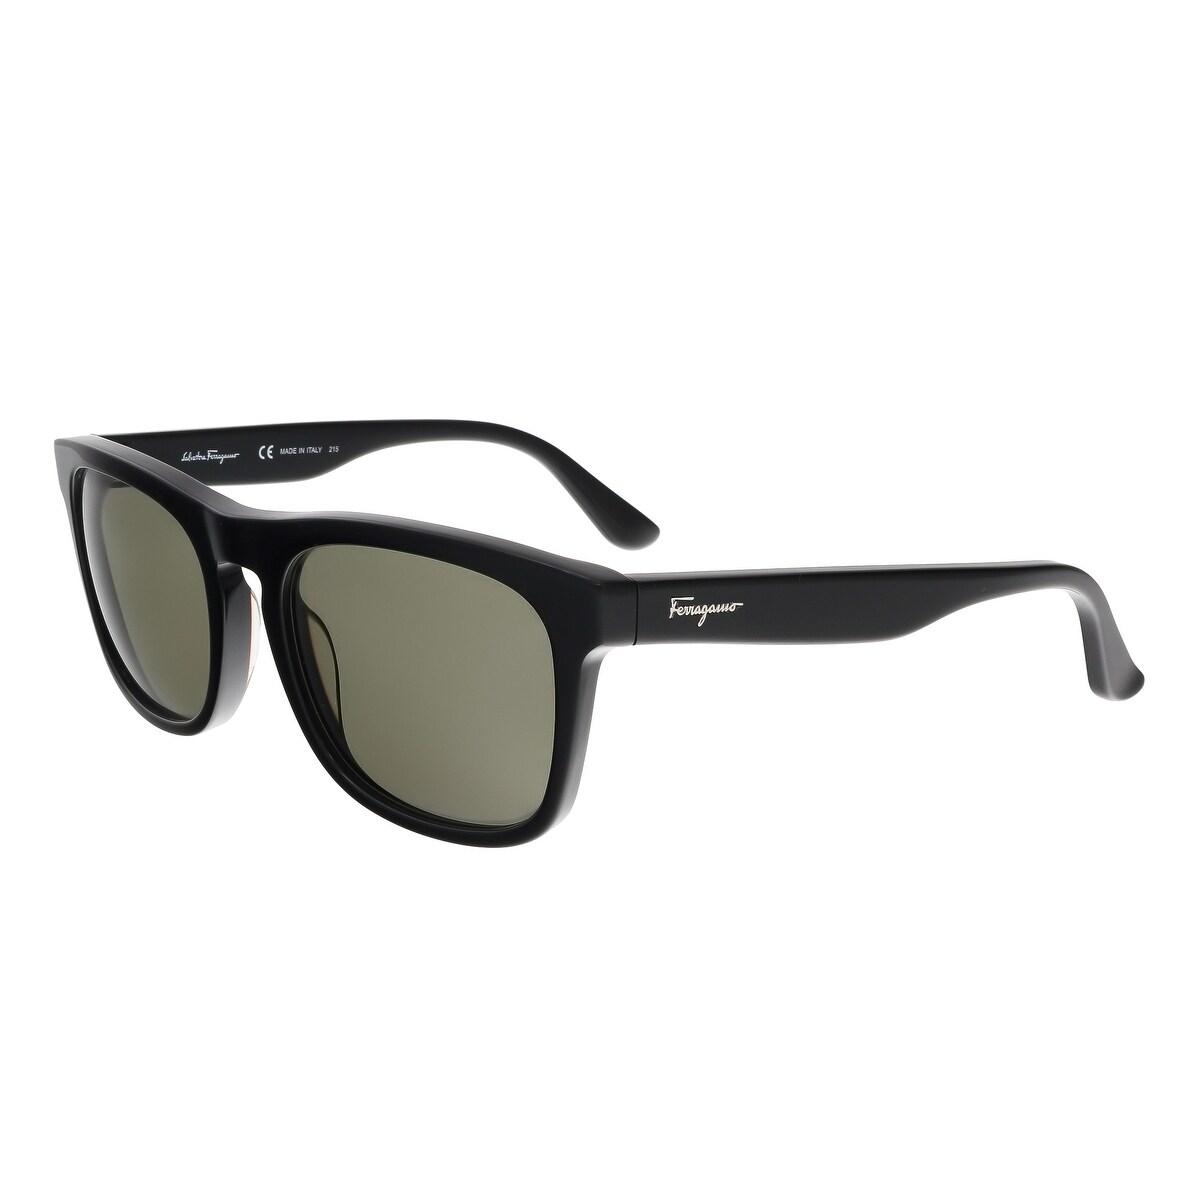 8c1b4fb30bf Salvatore Ferragamo SF776 S 001 Black Rectangle Feline Sunglasses